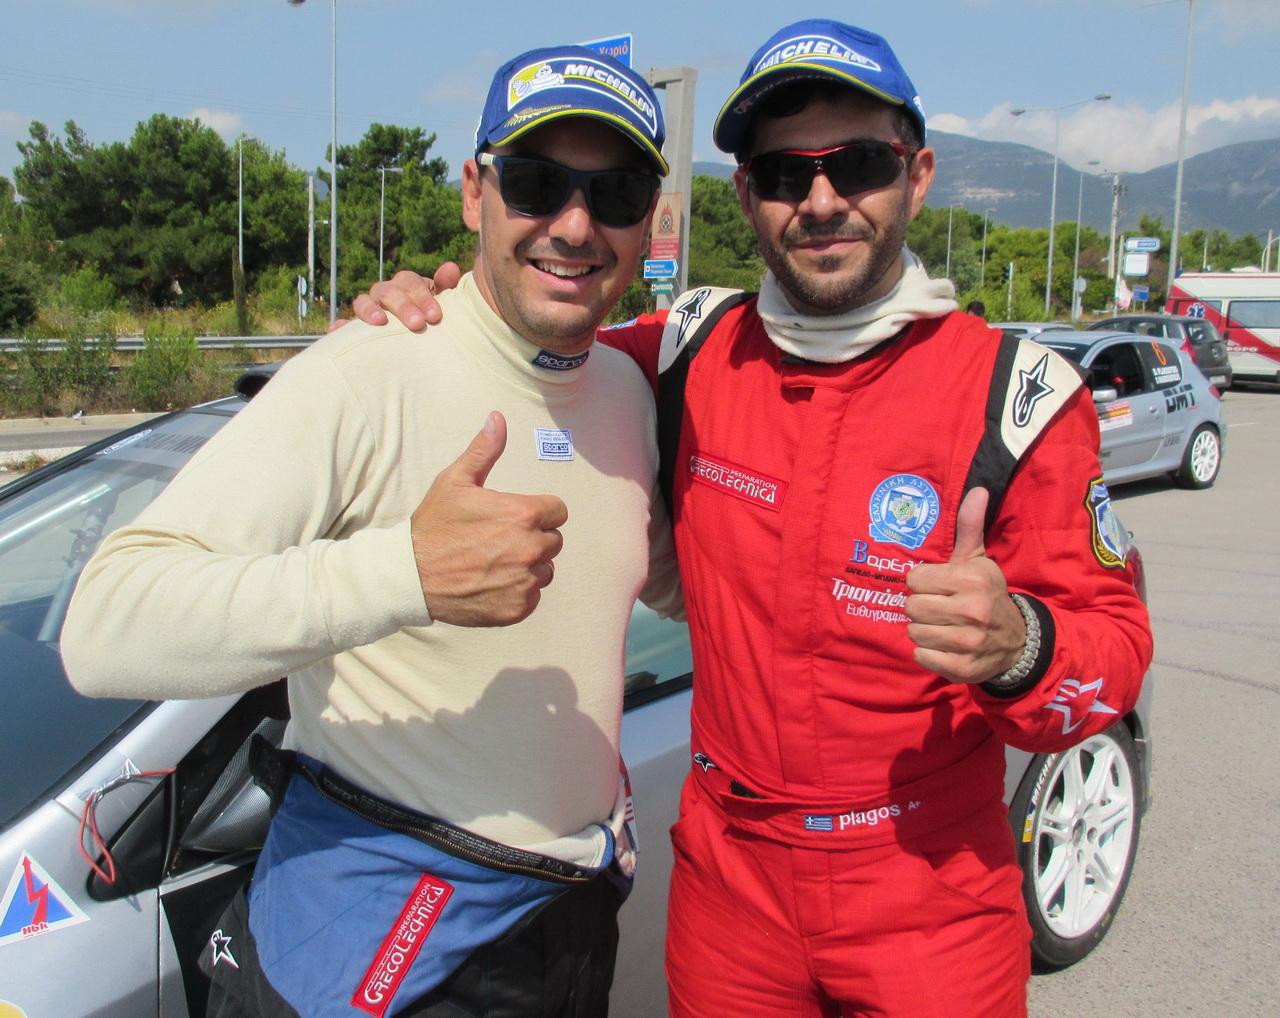 Rentis Plagos Ολοκληρώθηκε το 4ο Athens Rally Sprint με νικητή τον Πλάγο με Honda Civic Type-R